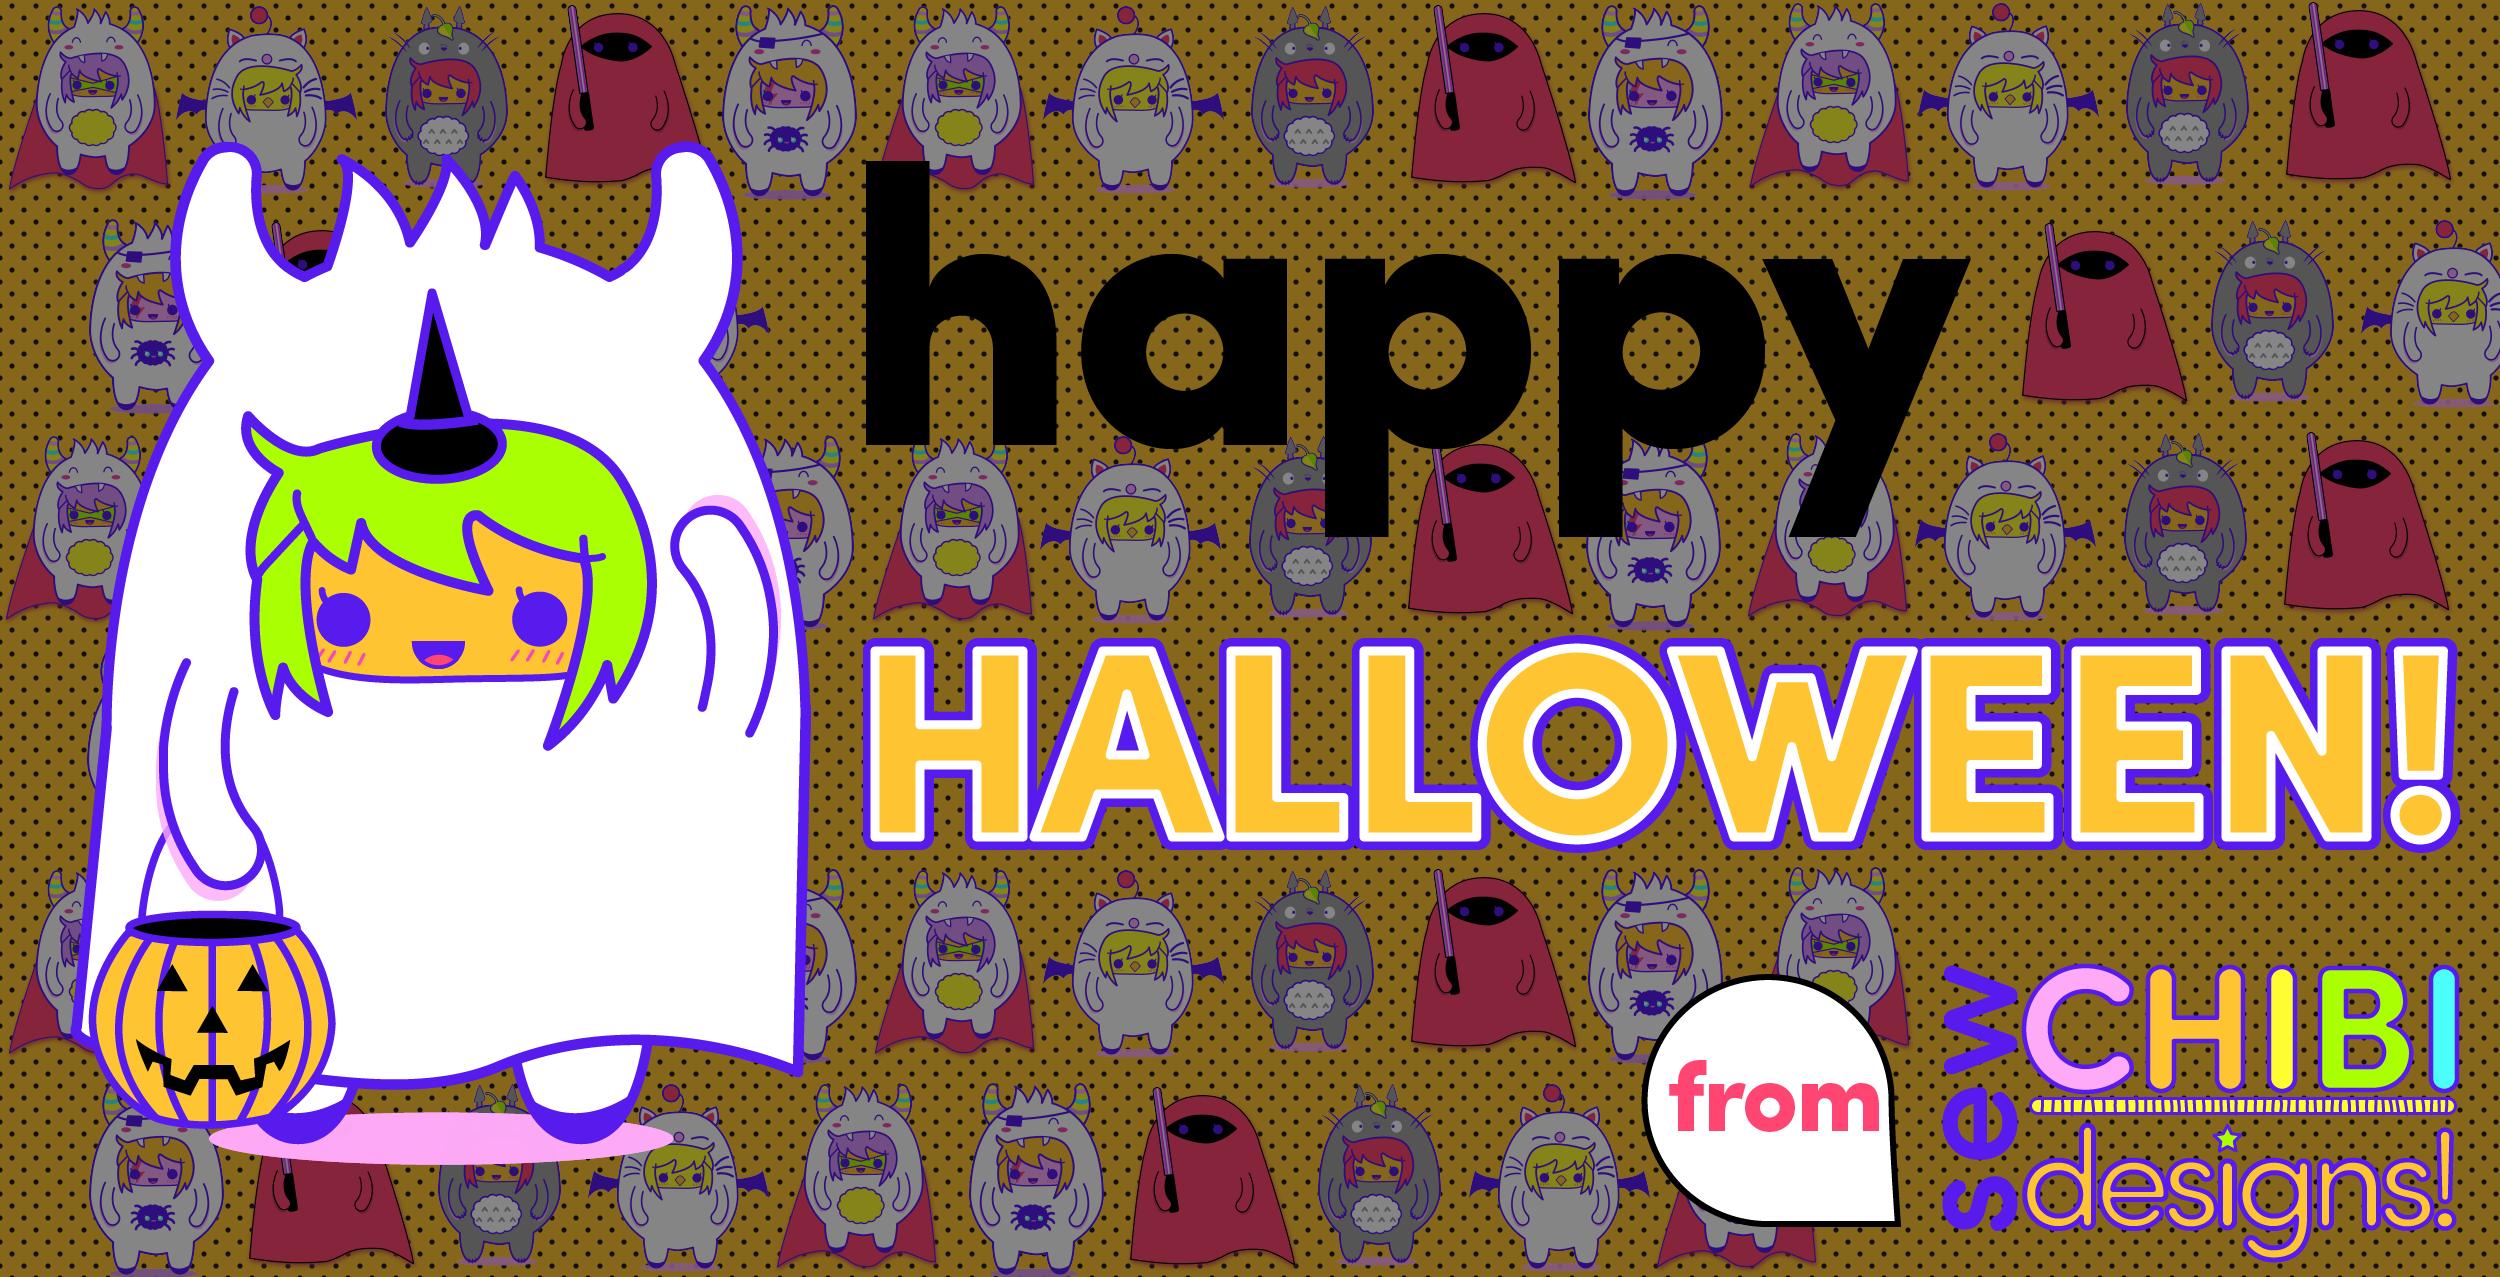 happy halloween sew chibi designs